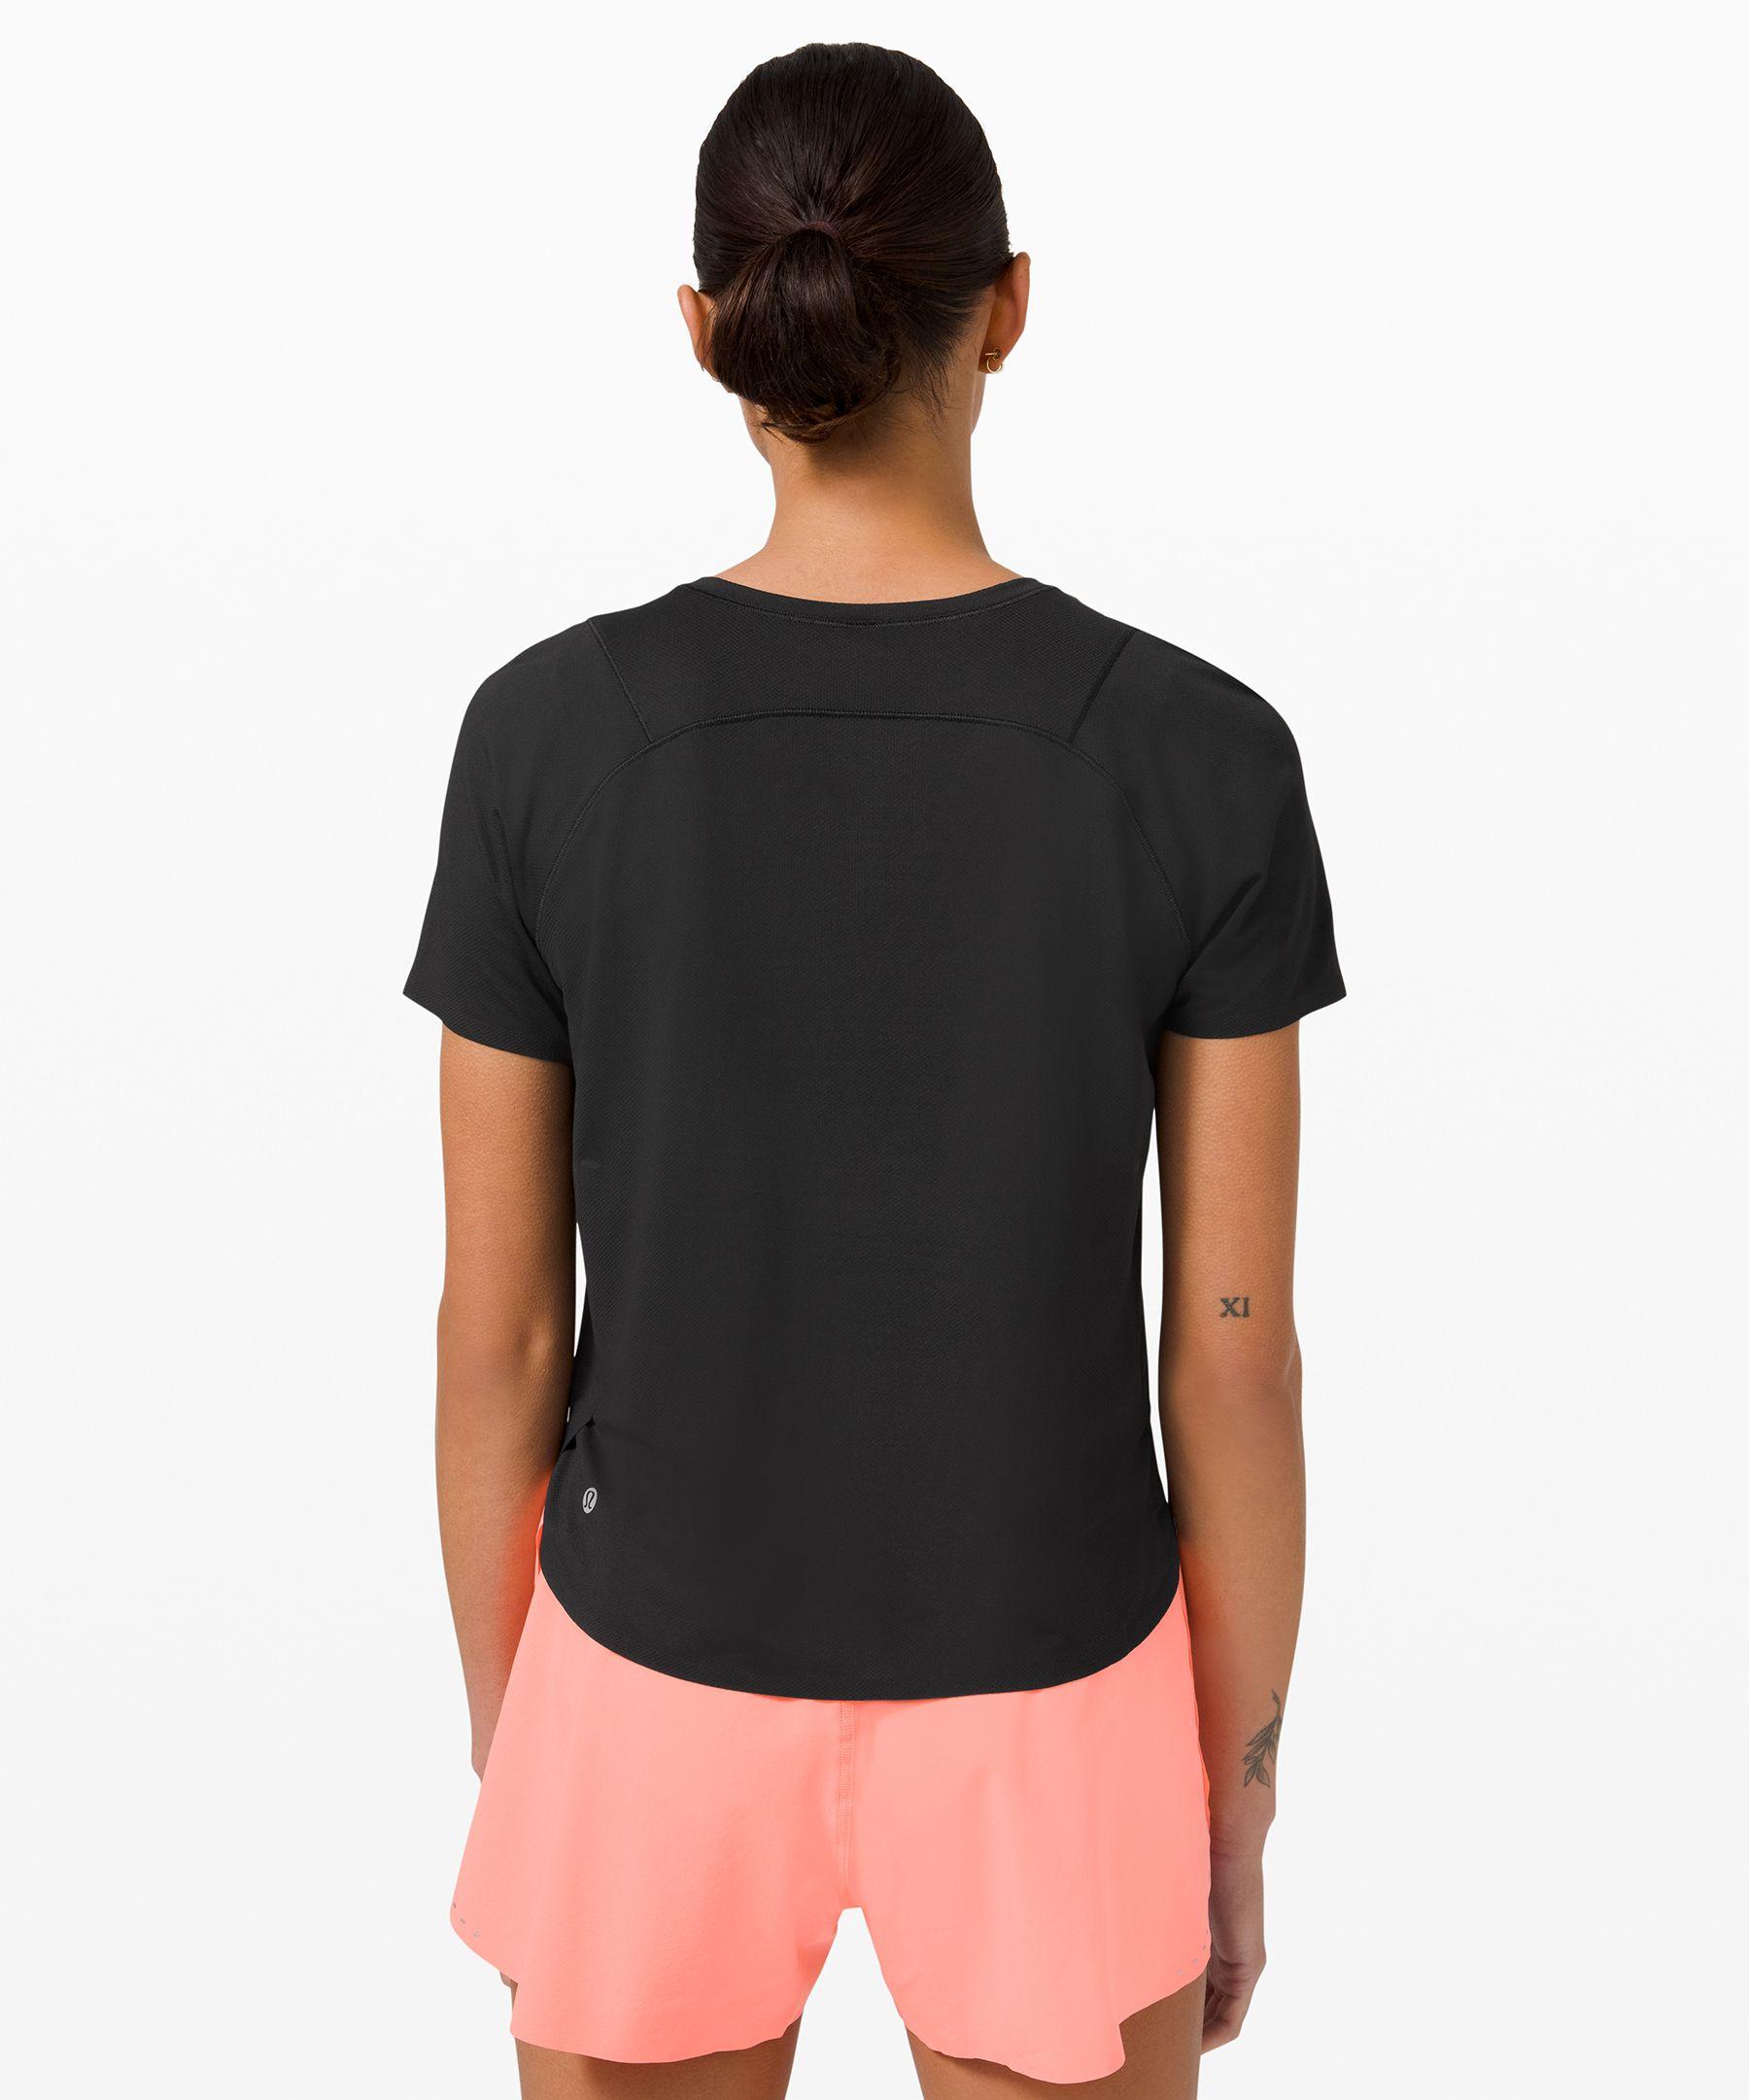 Lightweight Run Kit Short Sleeve